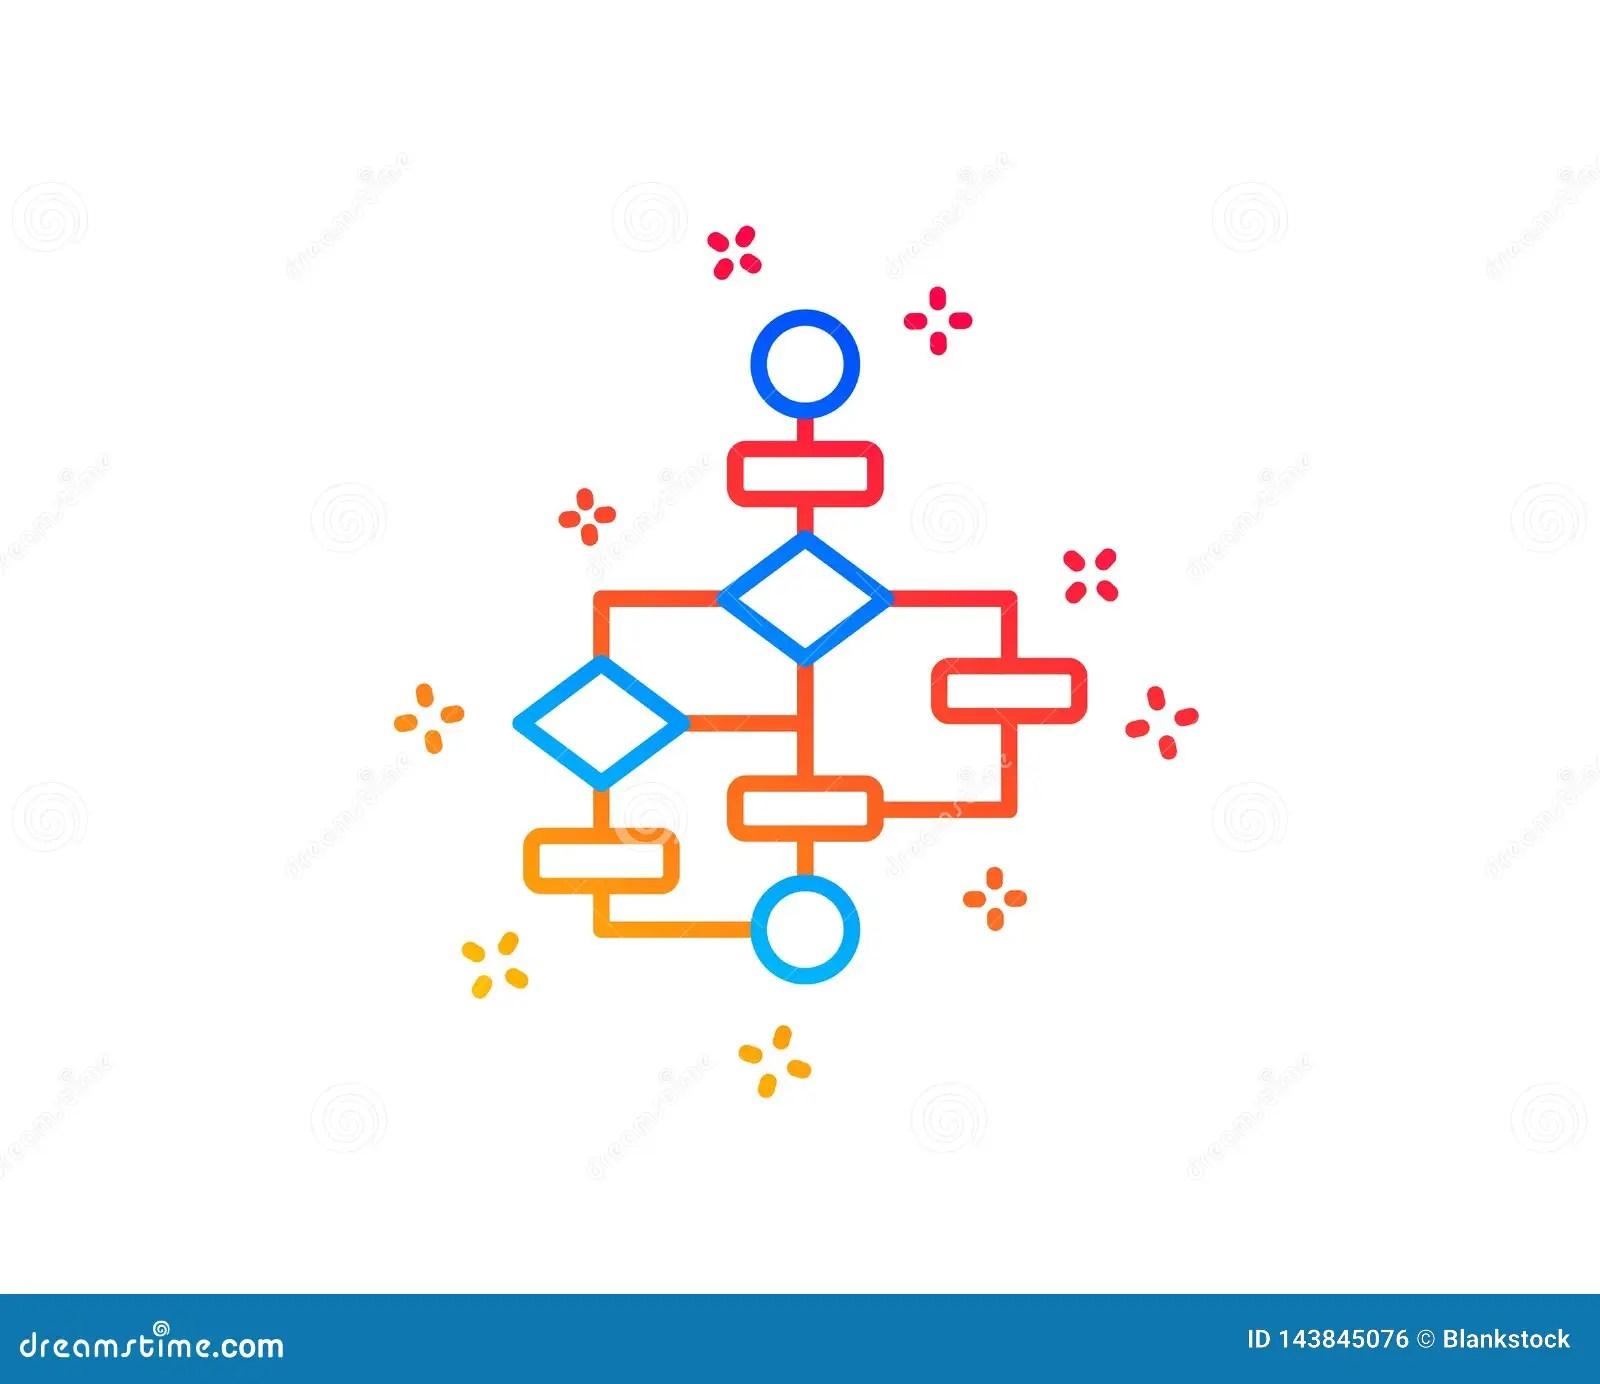 hight resolution of block diagram line icon path scheme sign algorithm symbol gradient design elements linear block diagram icon random shapes vector